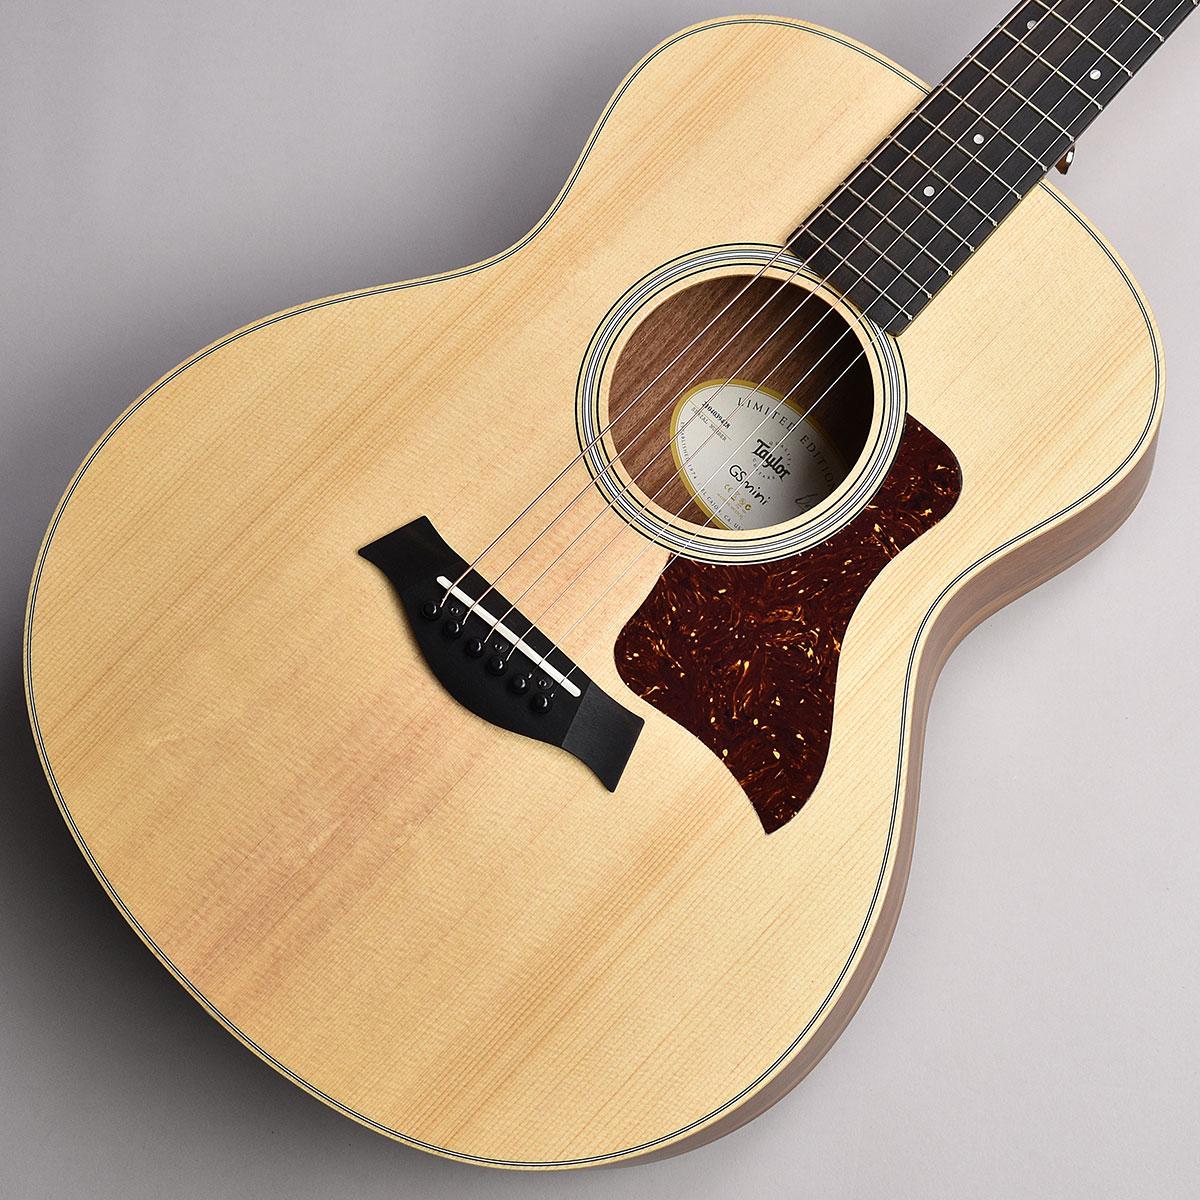 Taylor GS Mini-e Ovangkol Limited S/N:2104039428 ミニアコースティックギター【エレアコ】 【テイラー】【未展示品】